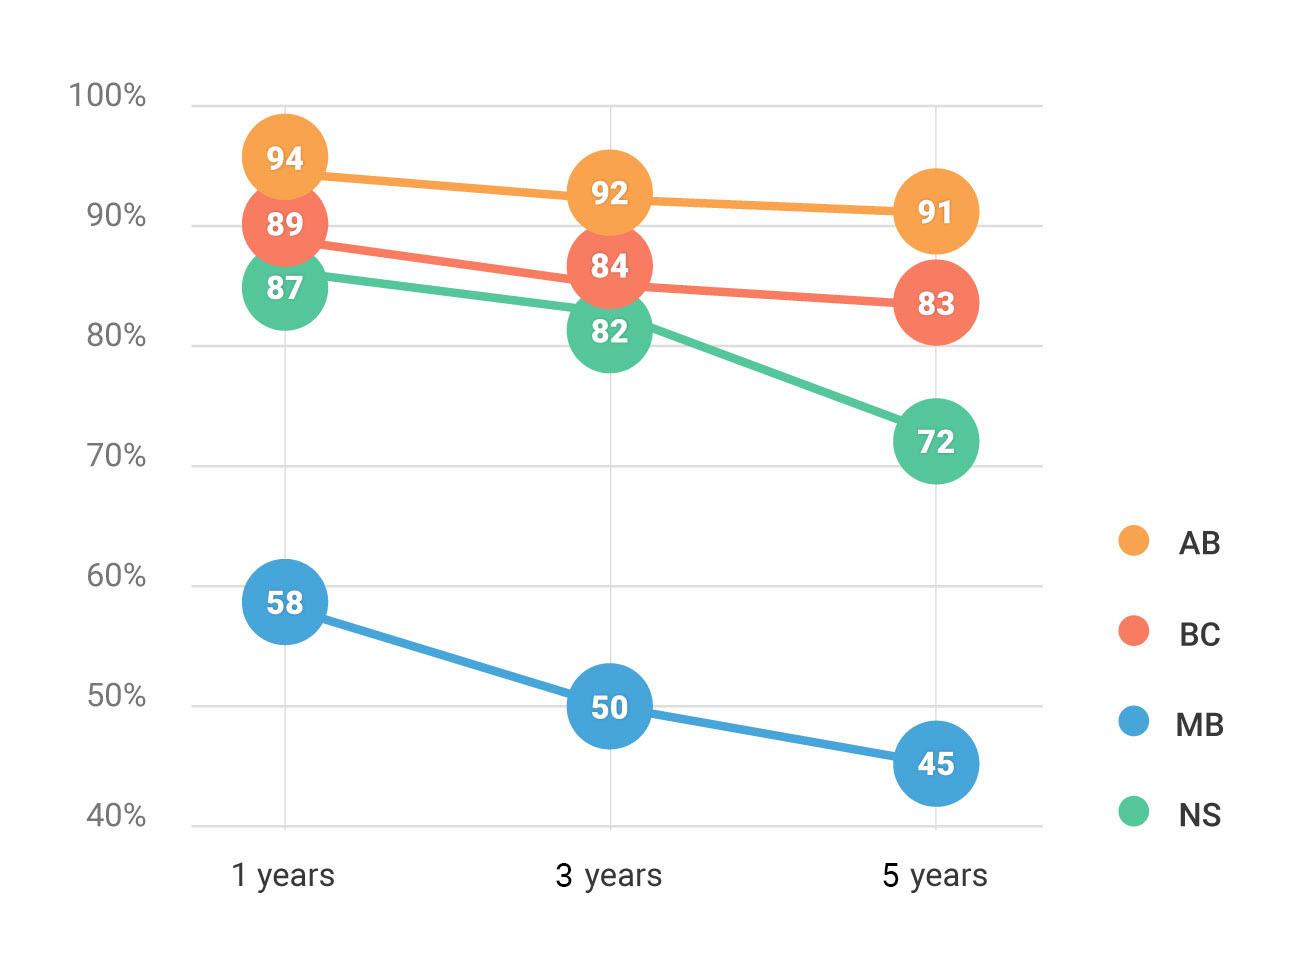 Fig. 1 Refugee retention in Alberta, BC, Manitoba, and Nova Scotia, 2010-2012 cohorts